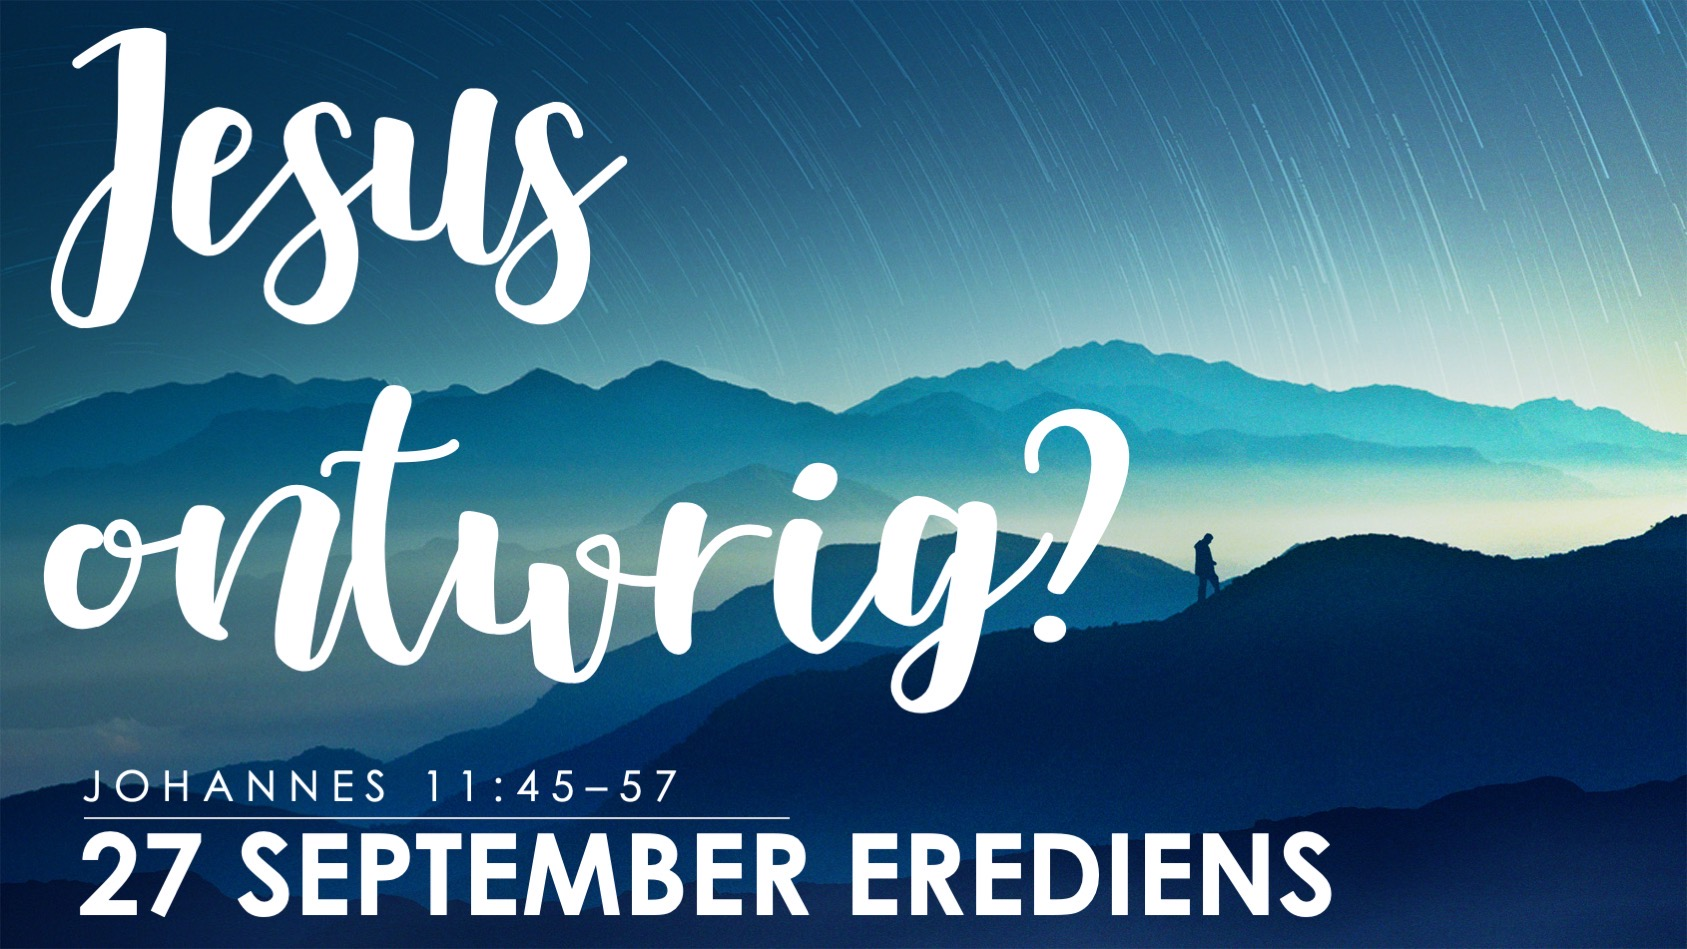 Jesus ontwrig? (27 September)